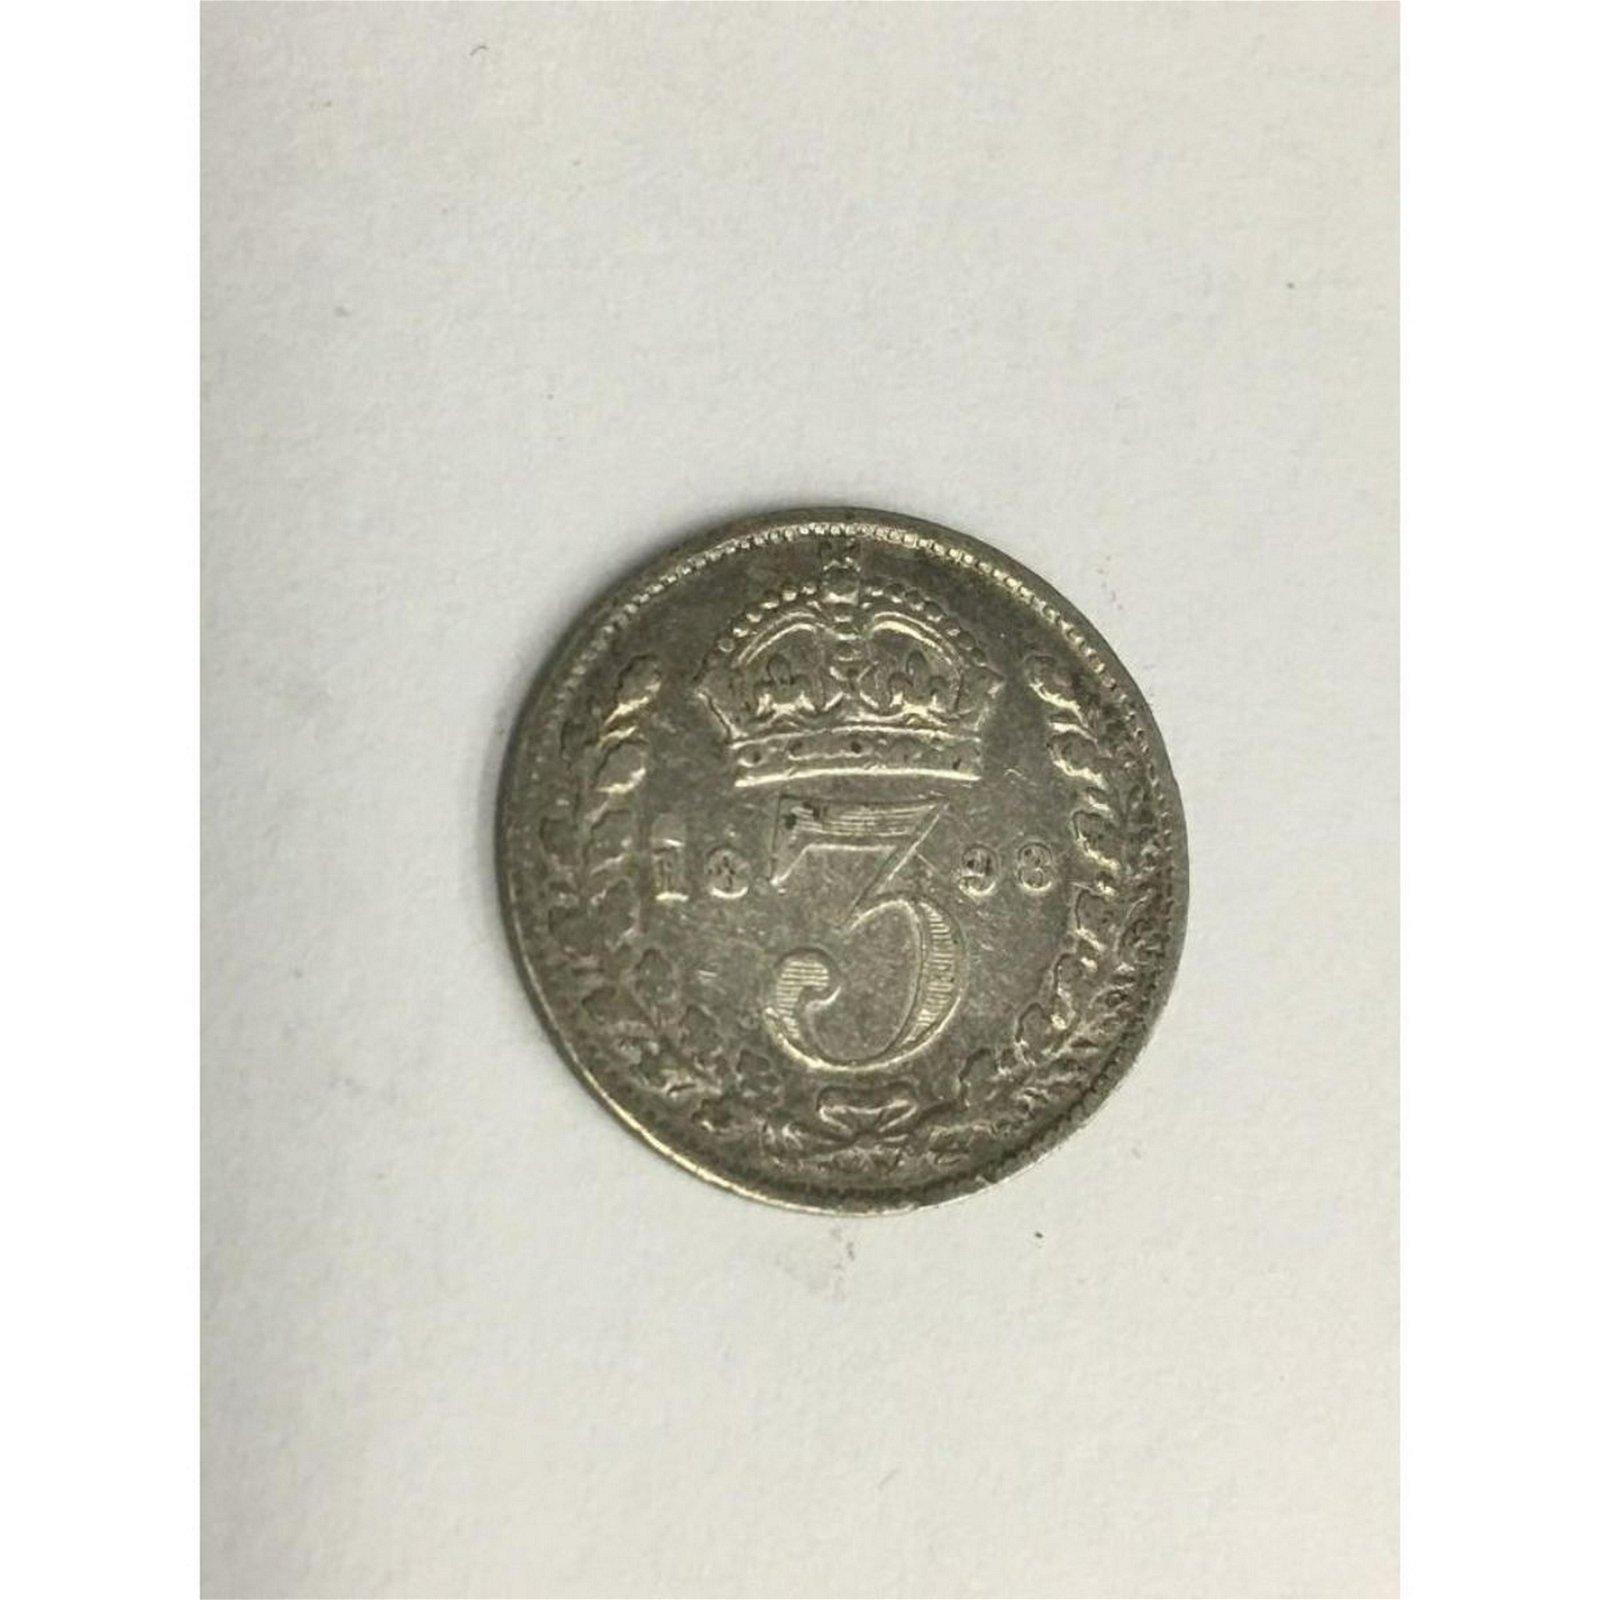 1898 UK Great Britain United Kingdom QUEEN VICTORIA 3